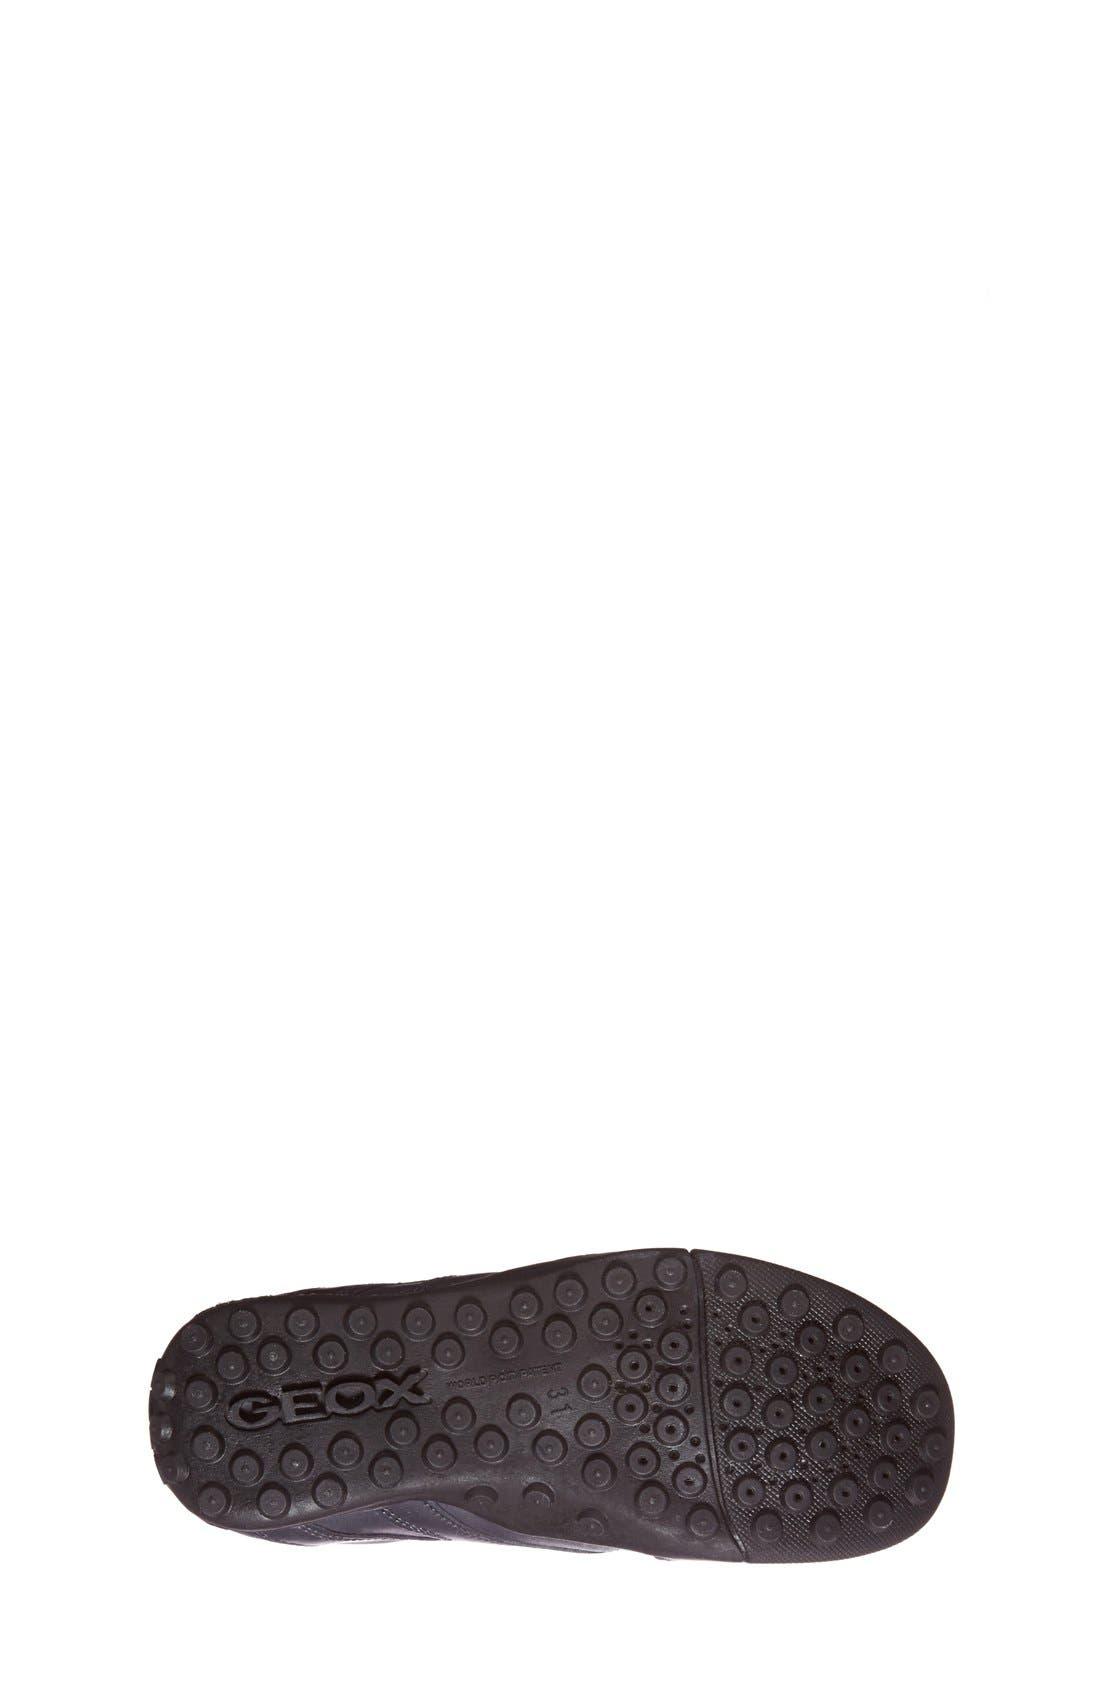 Snake Moc 2 Leather Waterproof Loafer,                             Alternate thumbnail 4, color,                             NAVY